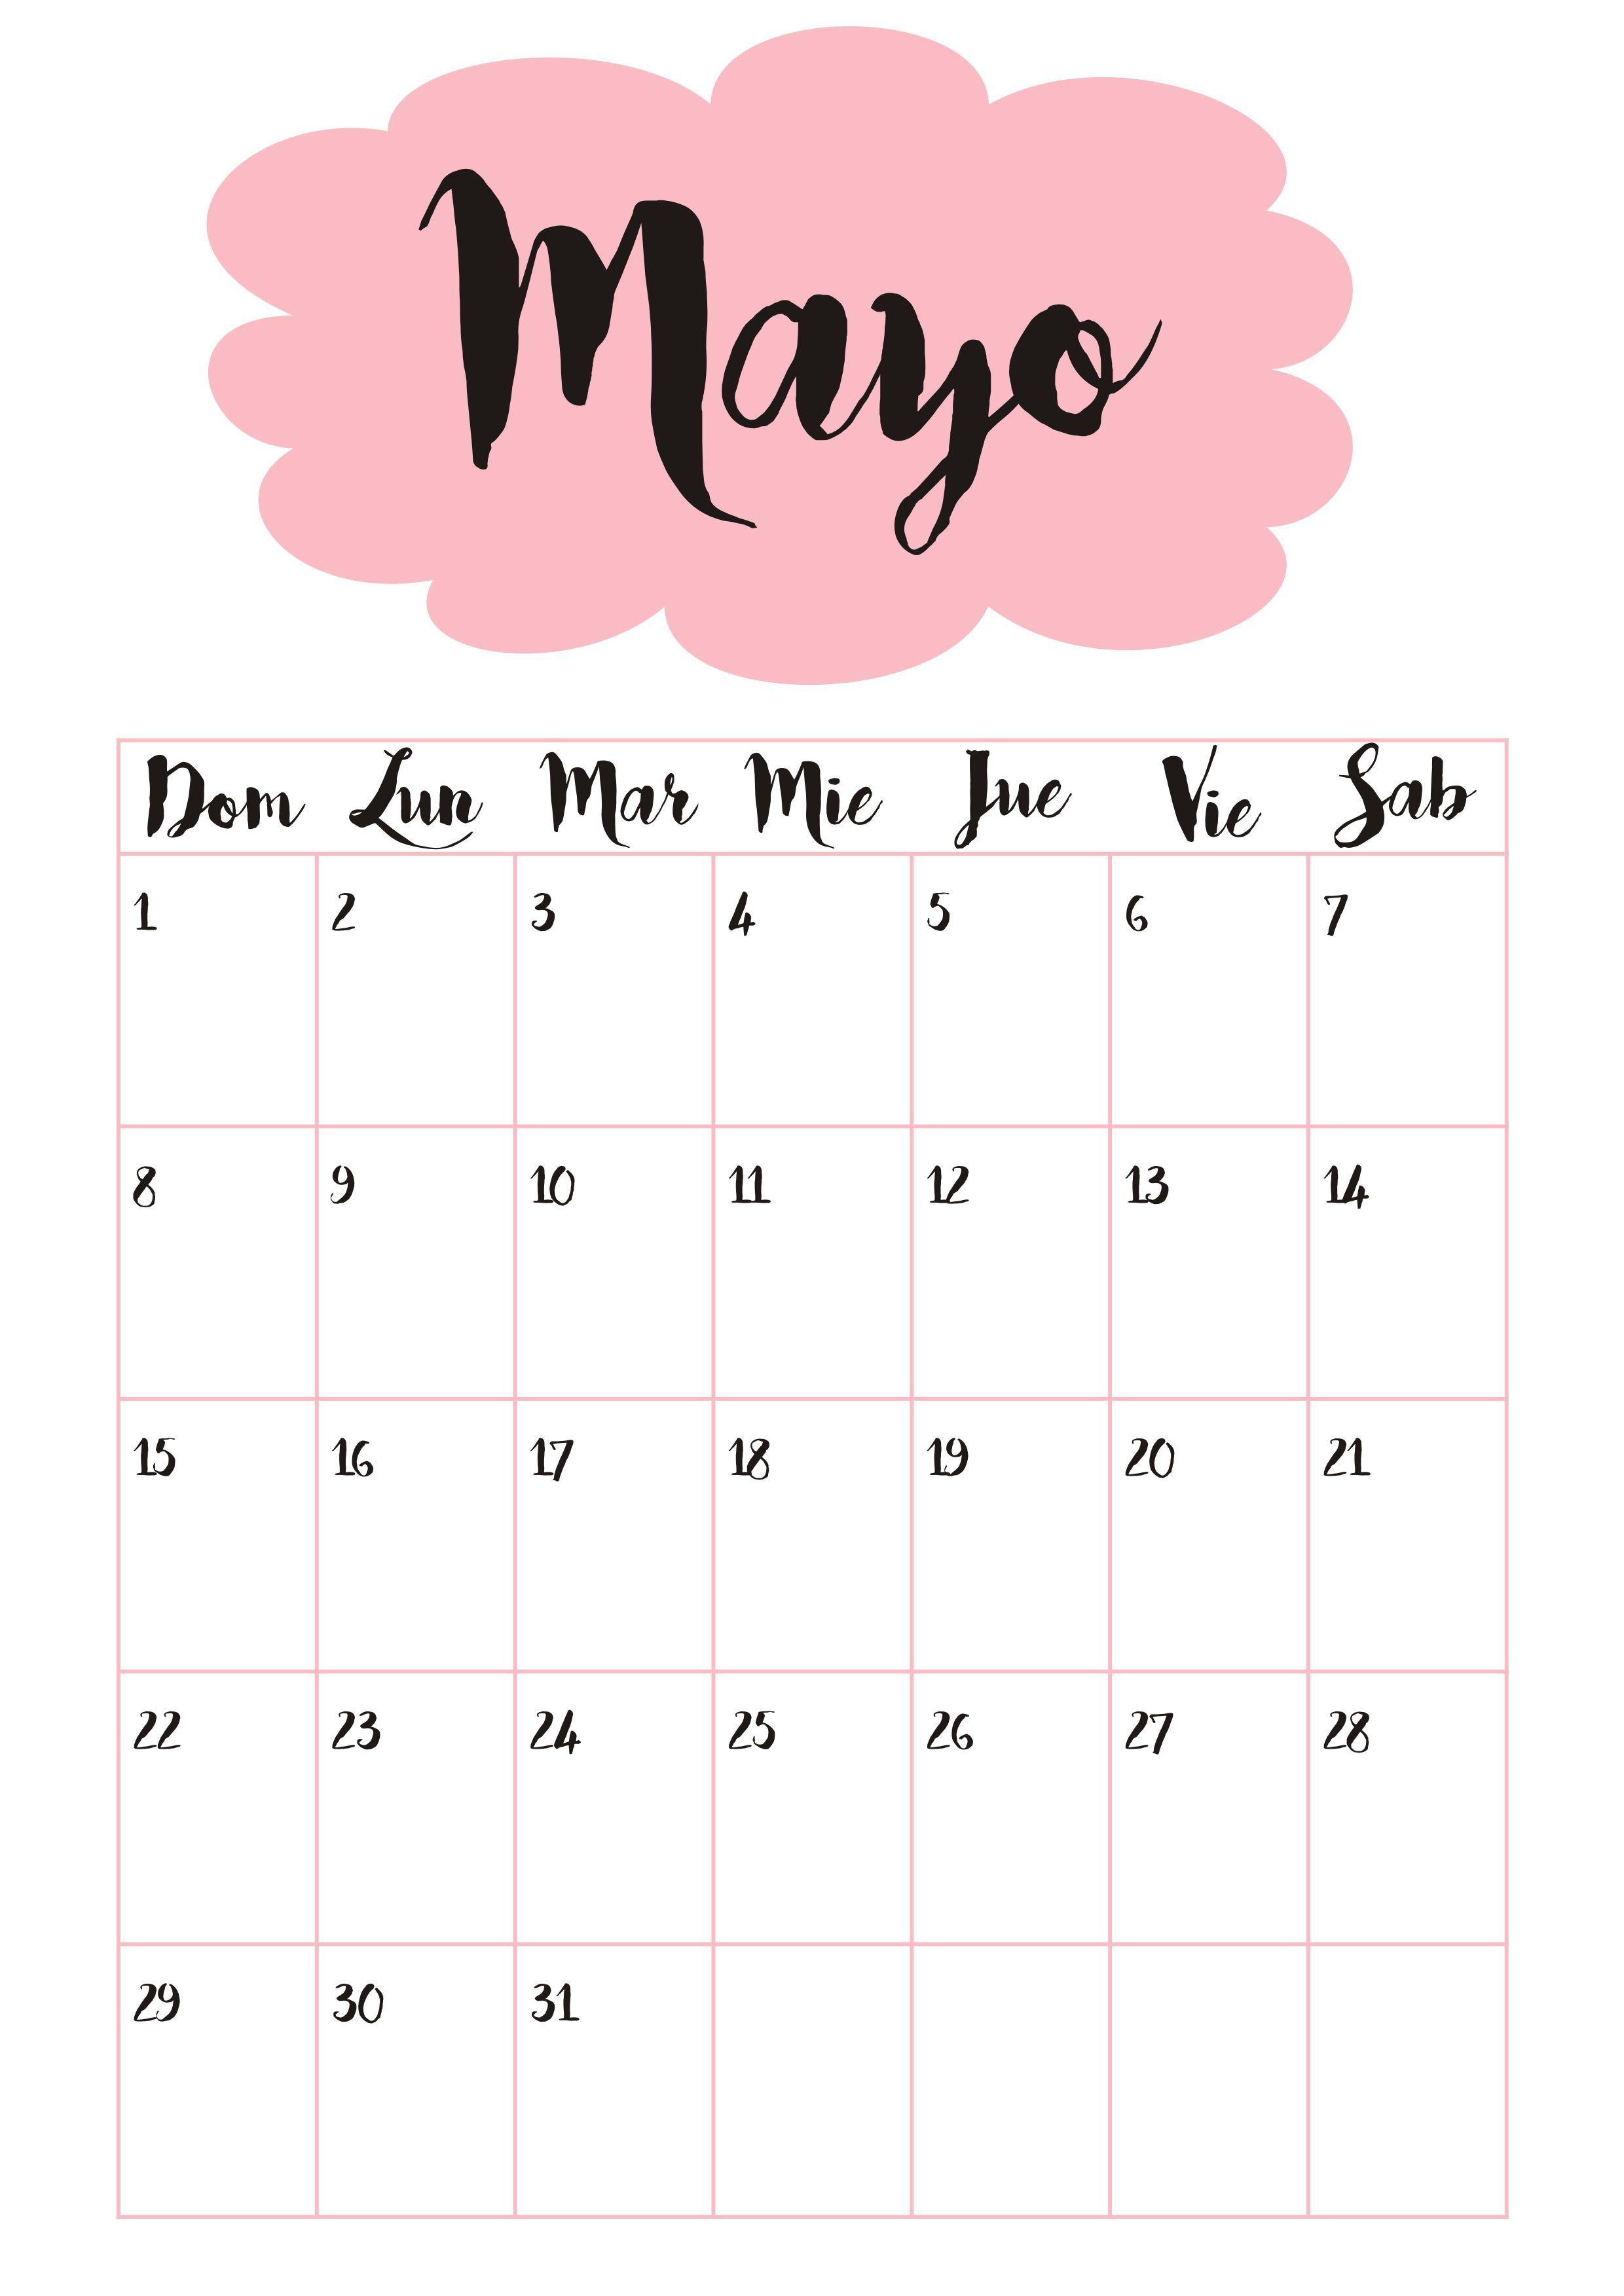 Calendario 5 Mayo